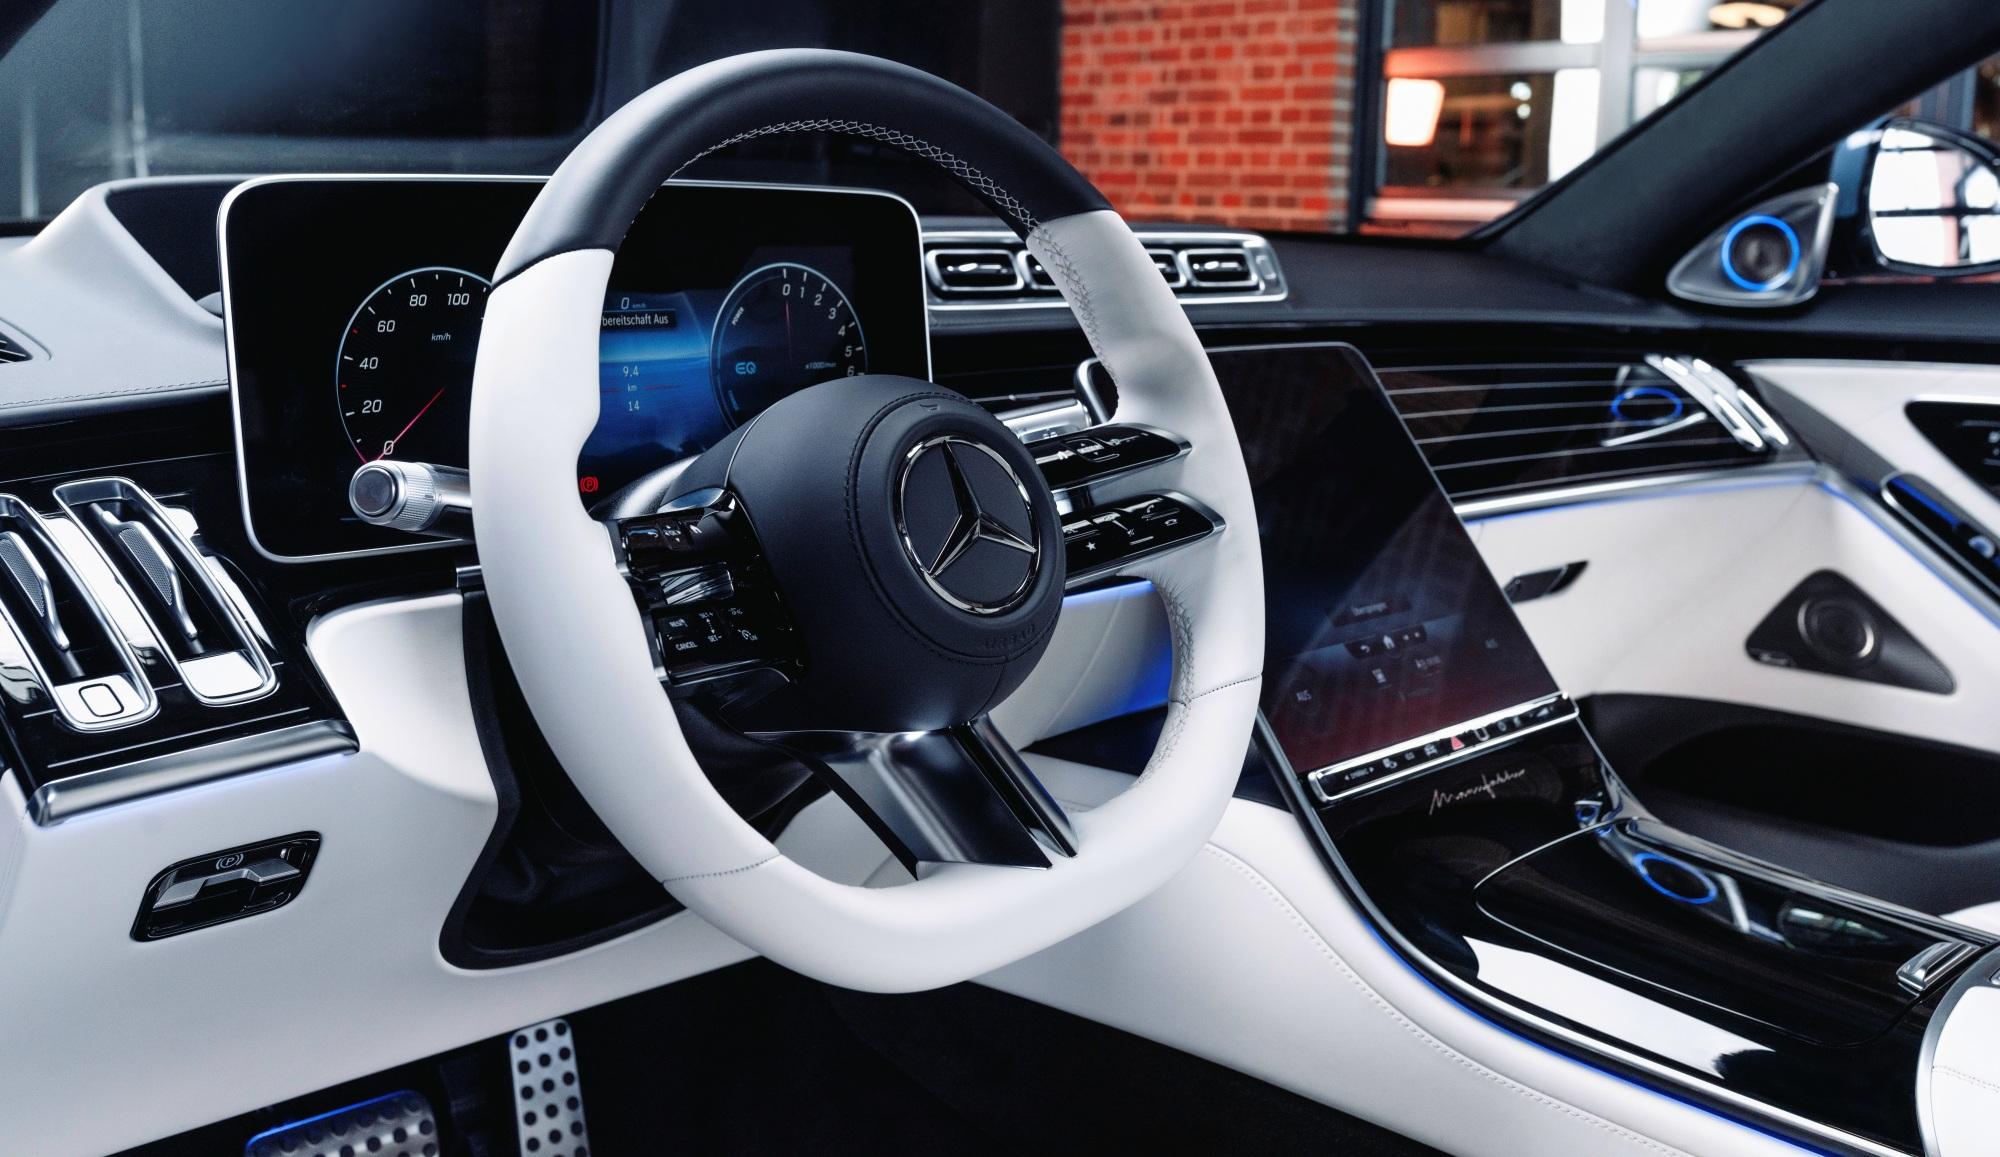 Mercedes klasy S deska